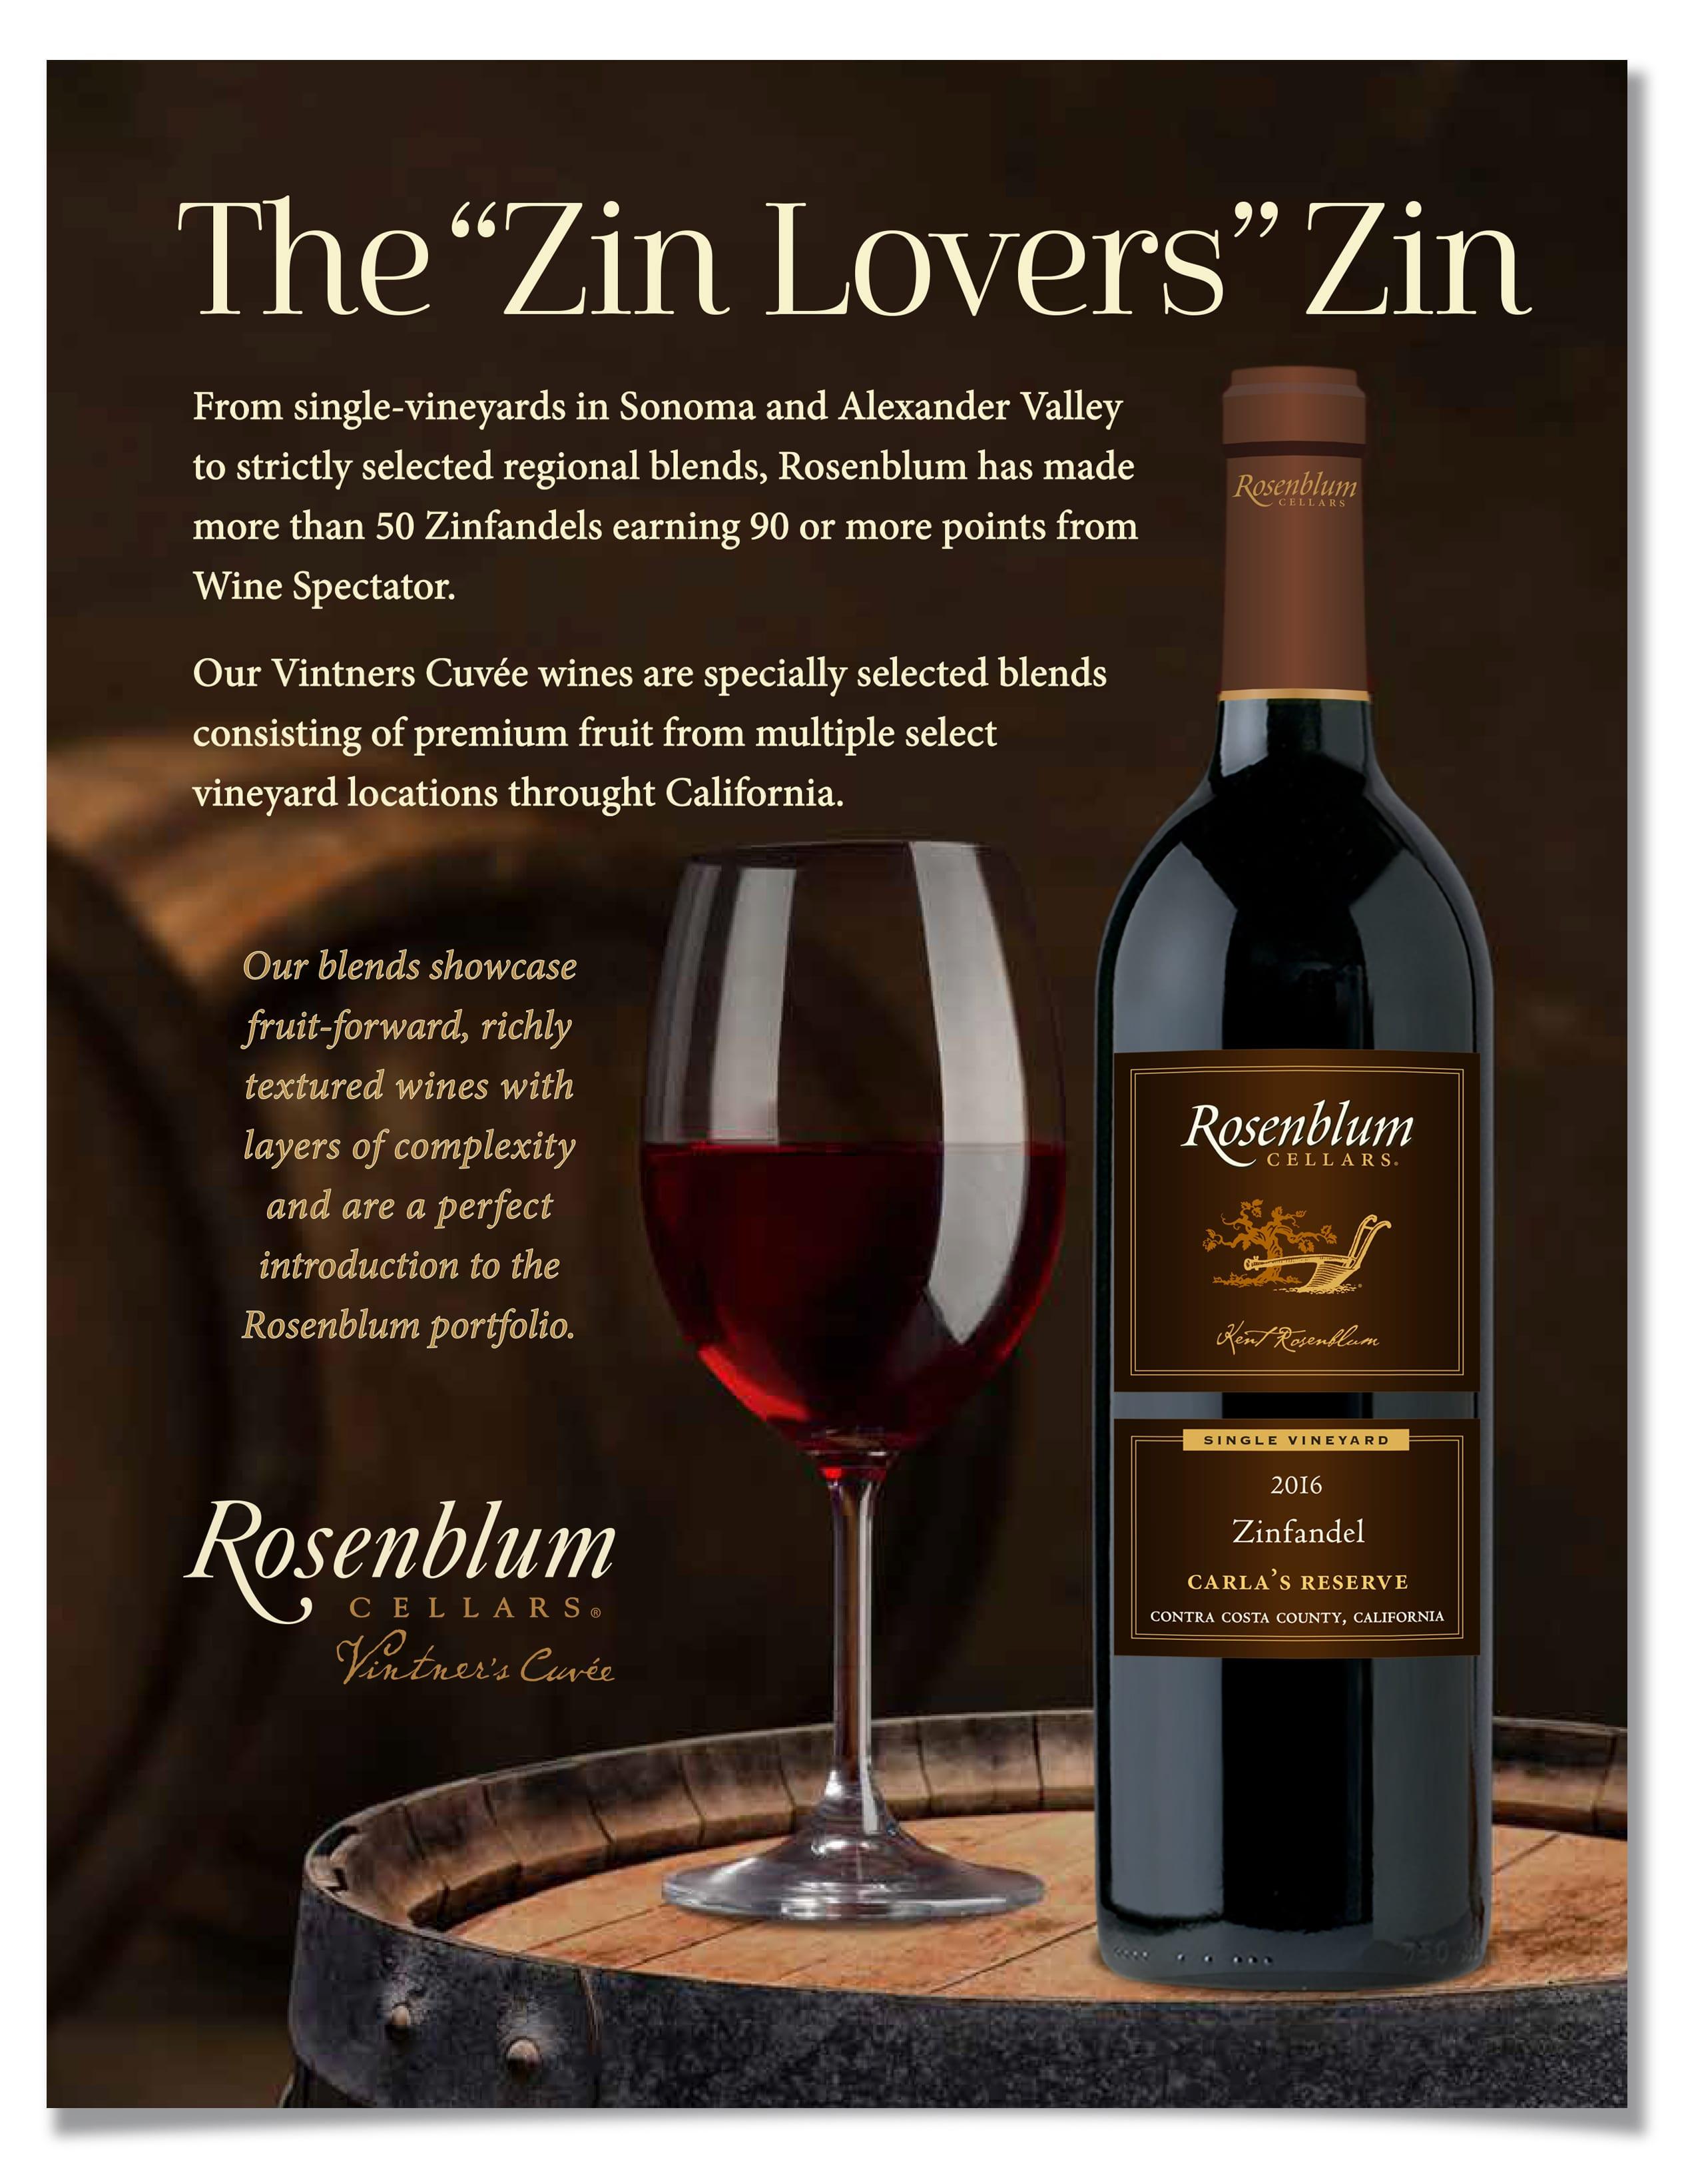 BergmanCramer | Rosenblum Wines